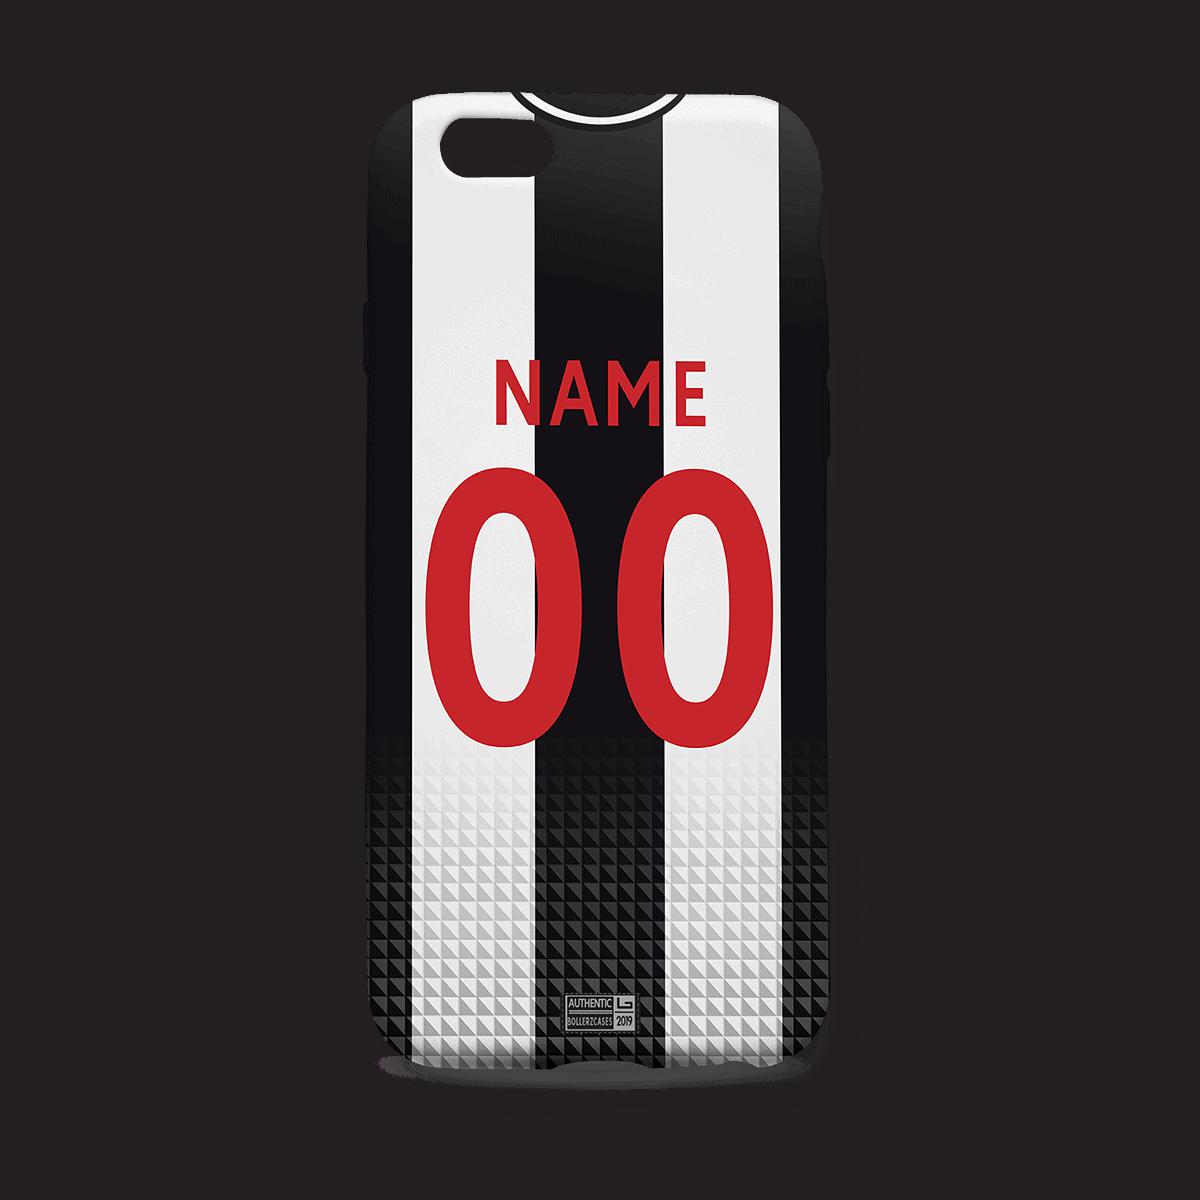 Newcastle 19-20 Home kit phone case